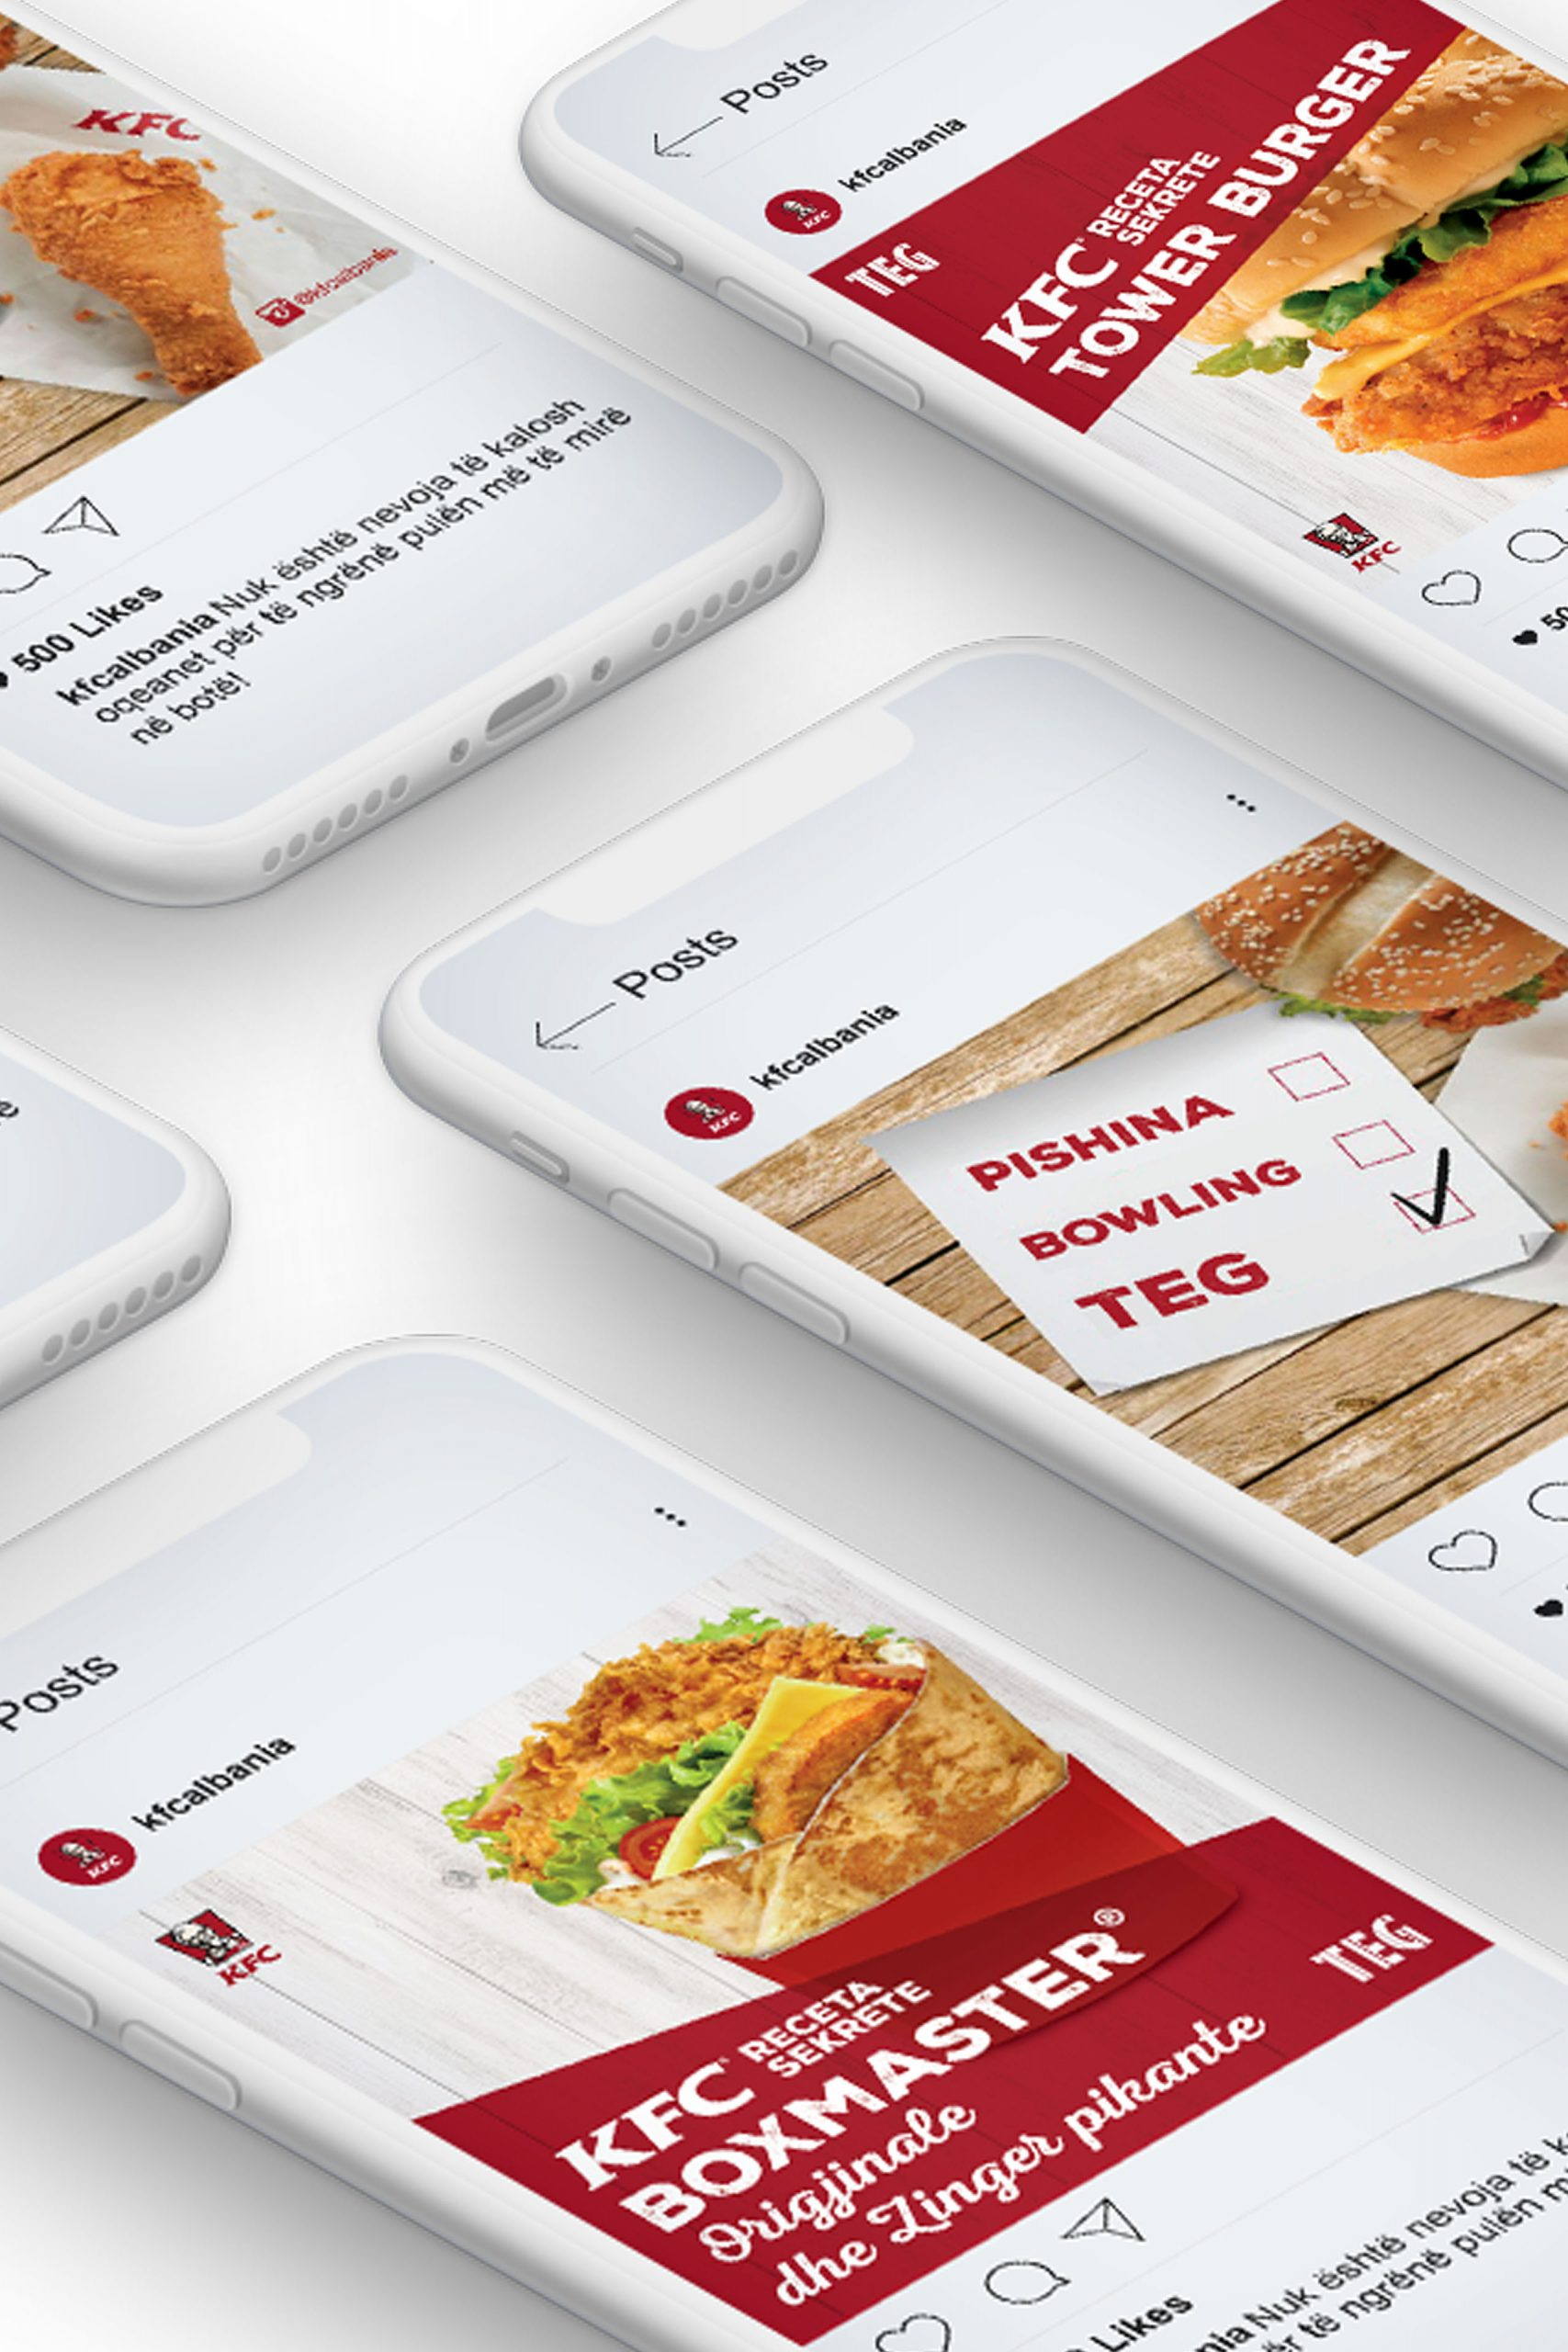 KFC, Project Img 4 - Vatra Agency / Founder & CEO Gerton Bejo